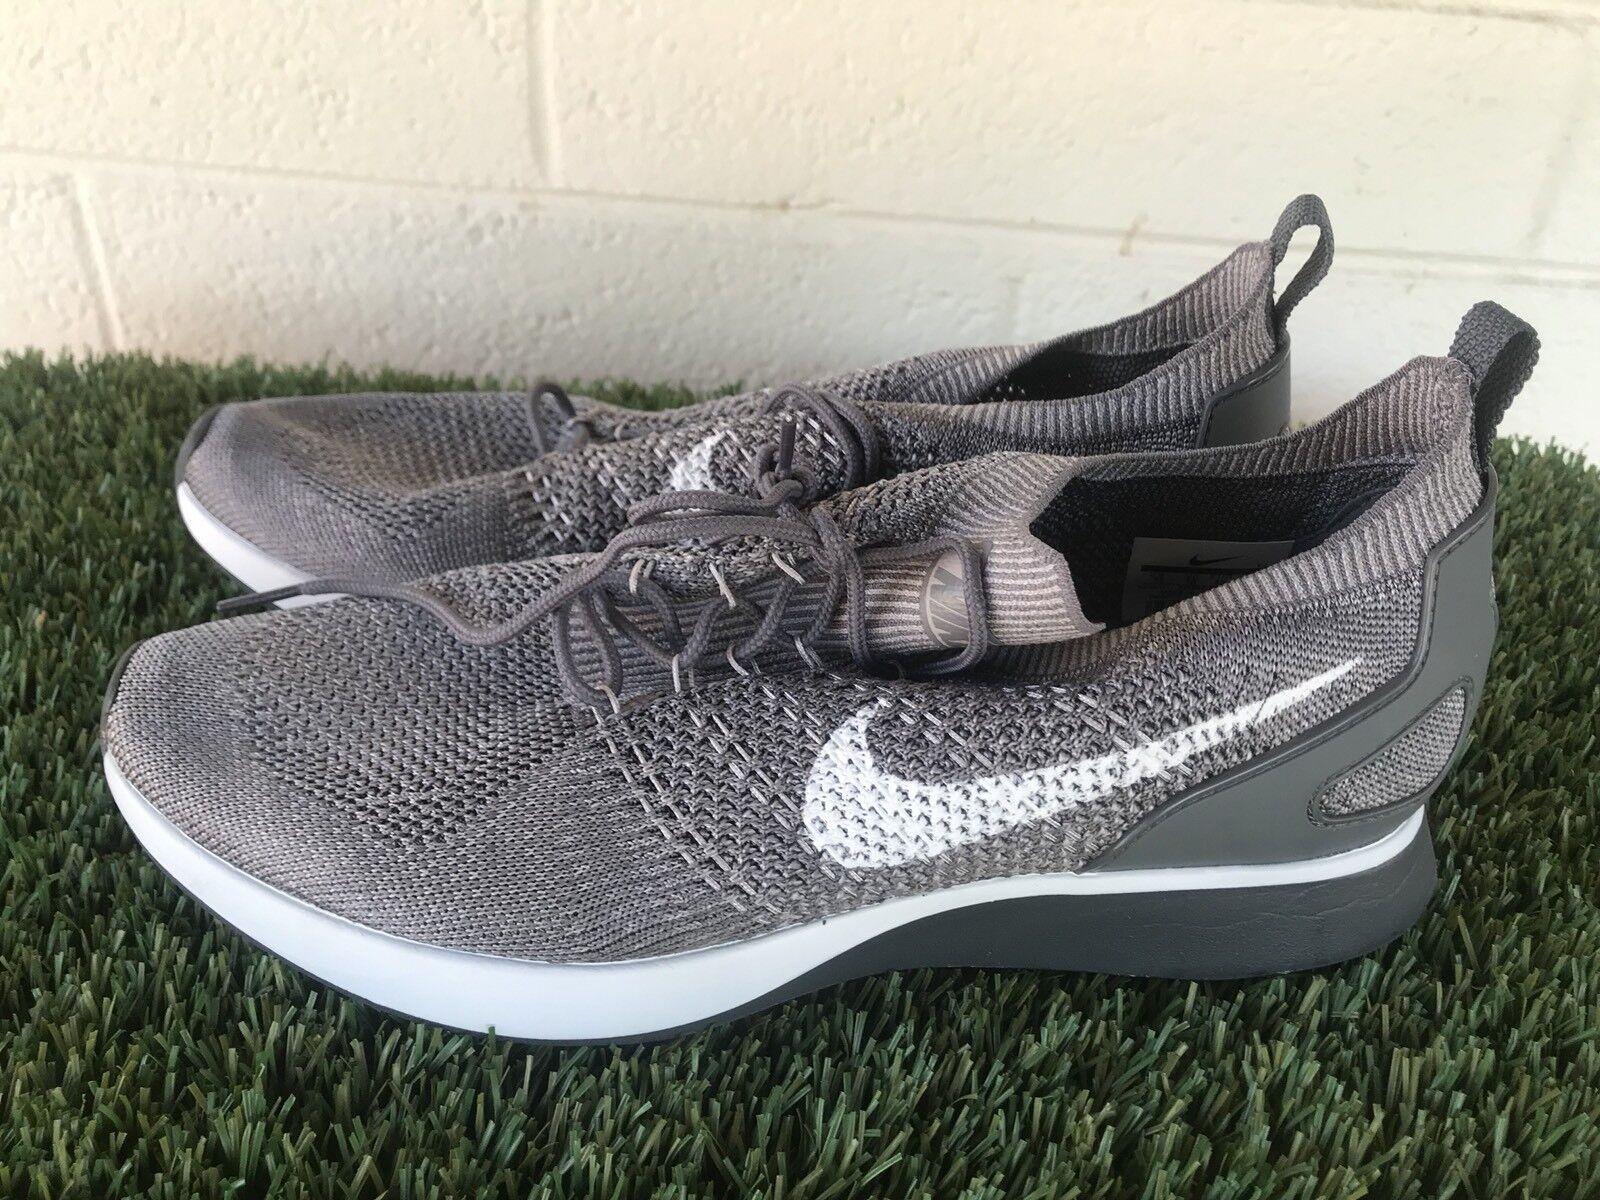 Uomo's Nike Air Zoom Mariah Flyknit Racer Running Shoes Size 11